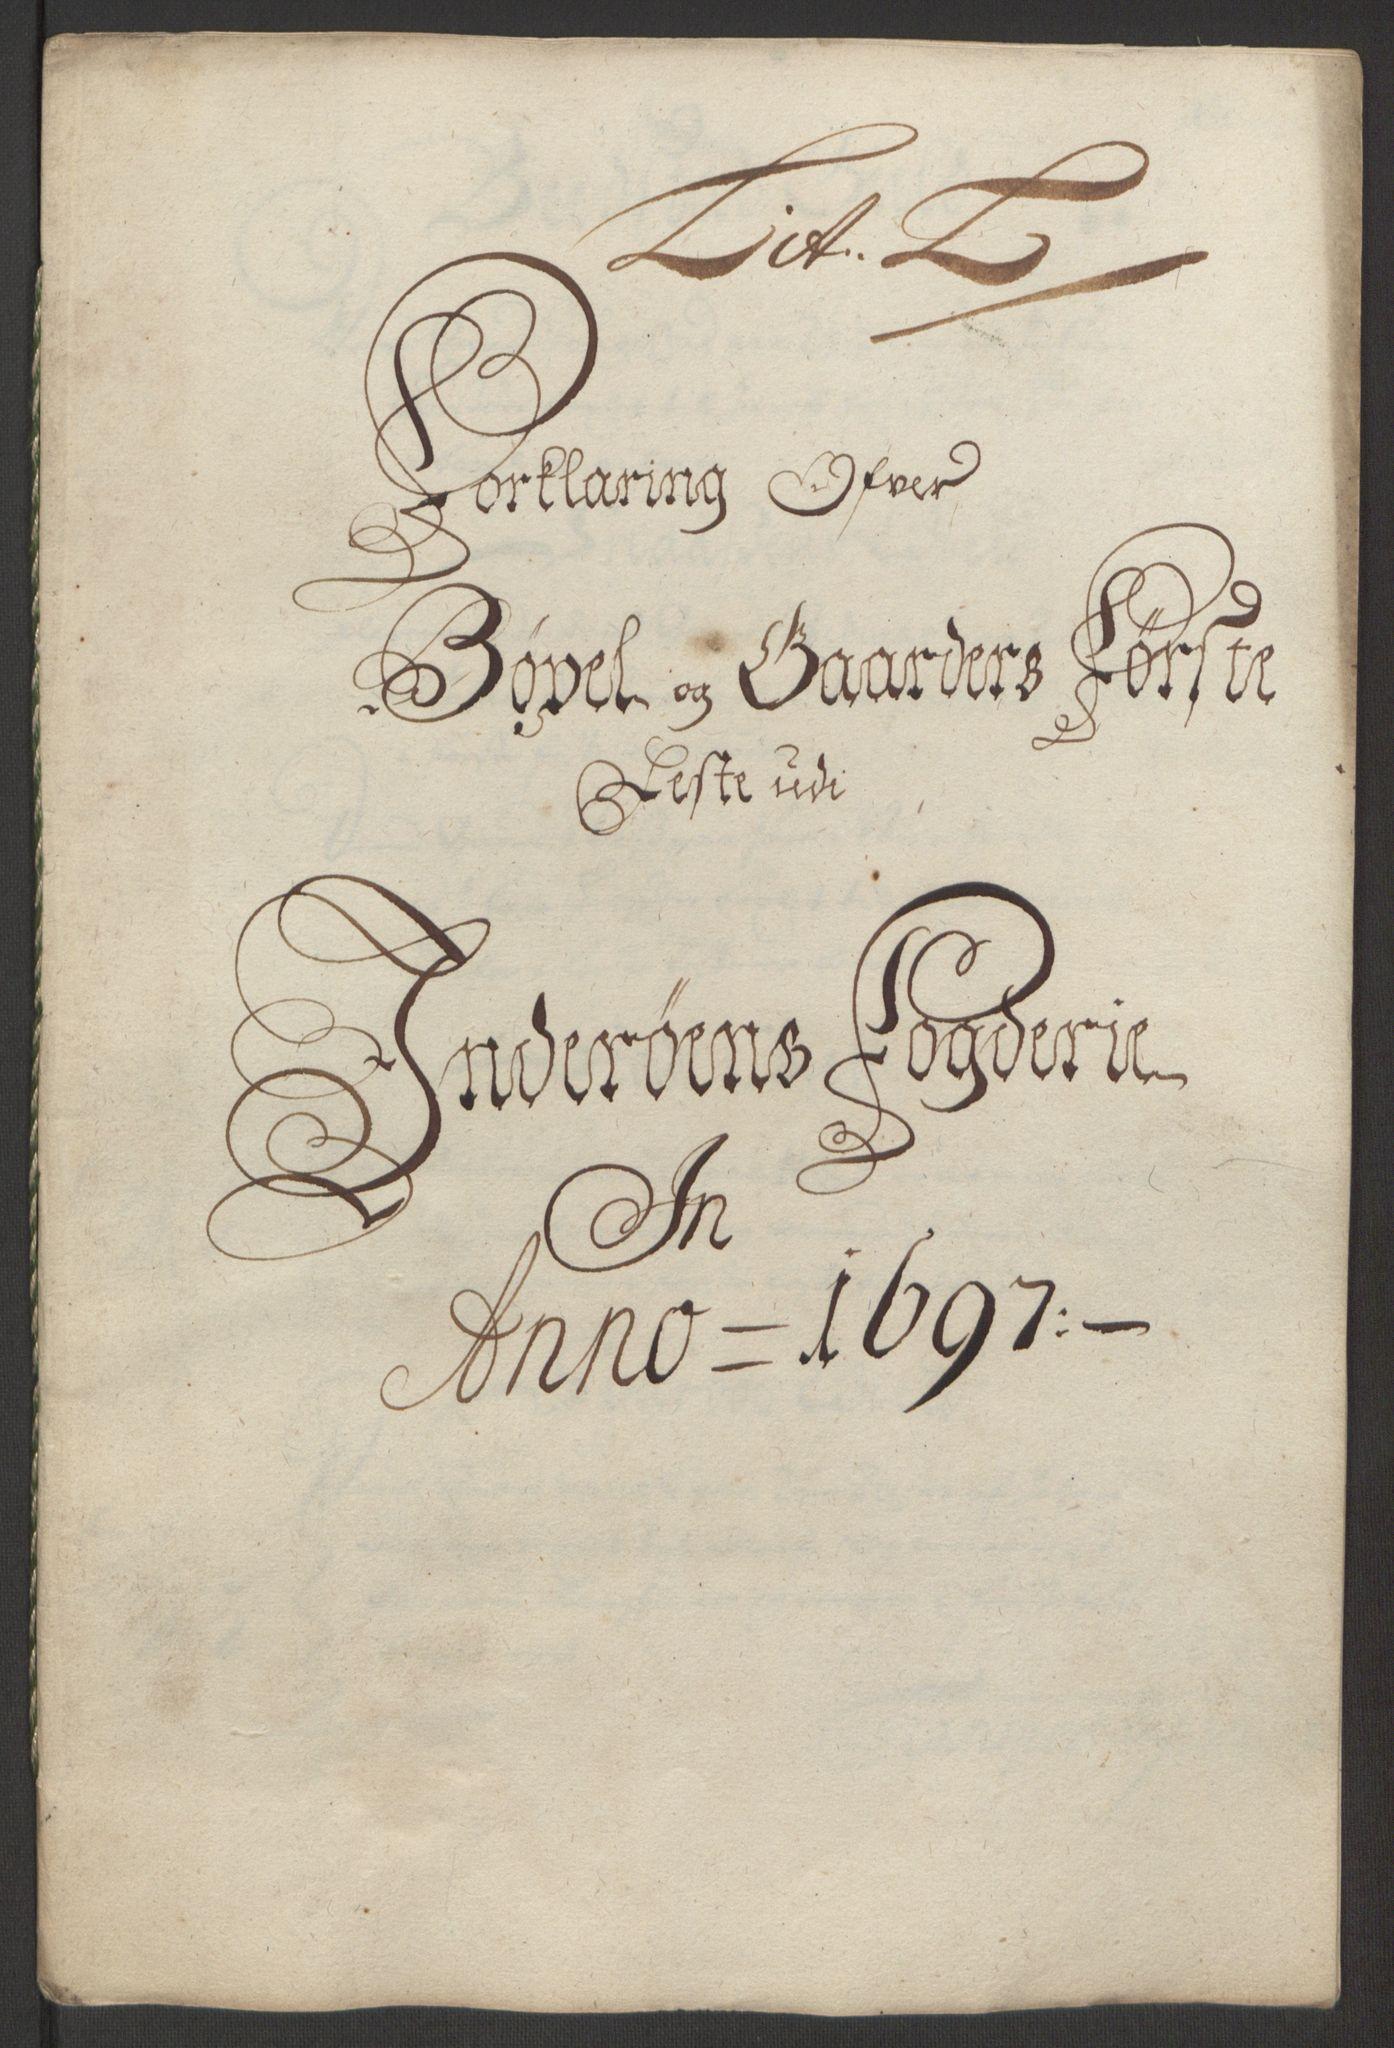 RA, Rentekammeret inntil 1814, Reviderte regnskaper, Fogderegnskap, R63/L4309: Fogderegnskap Inderøy, 1695-1697, s. 491